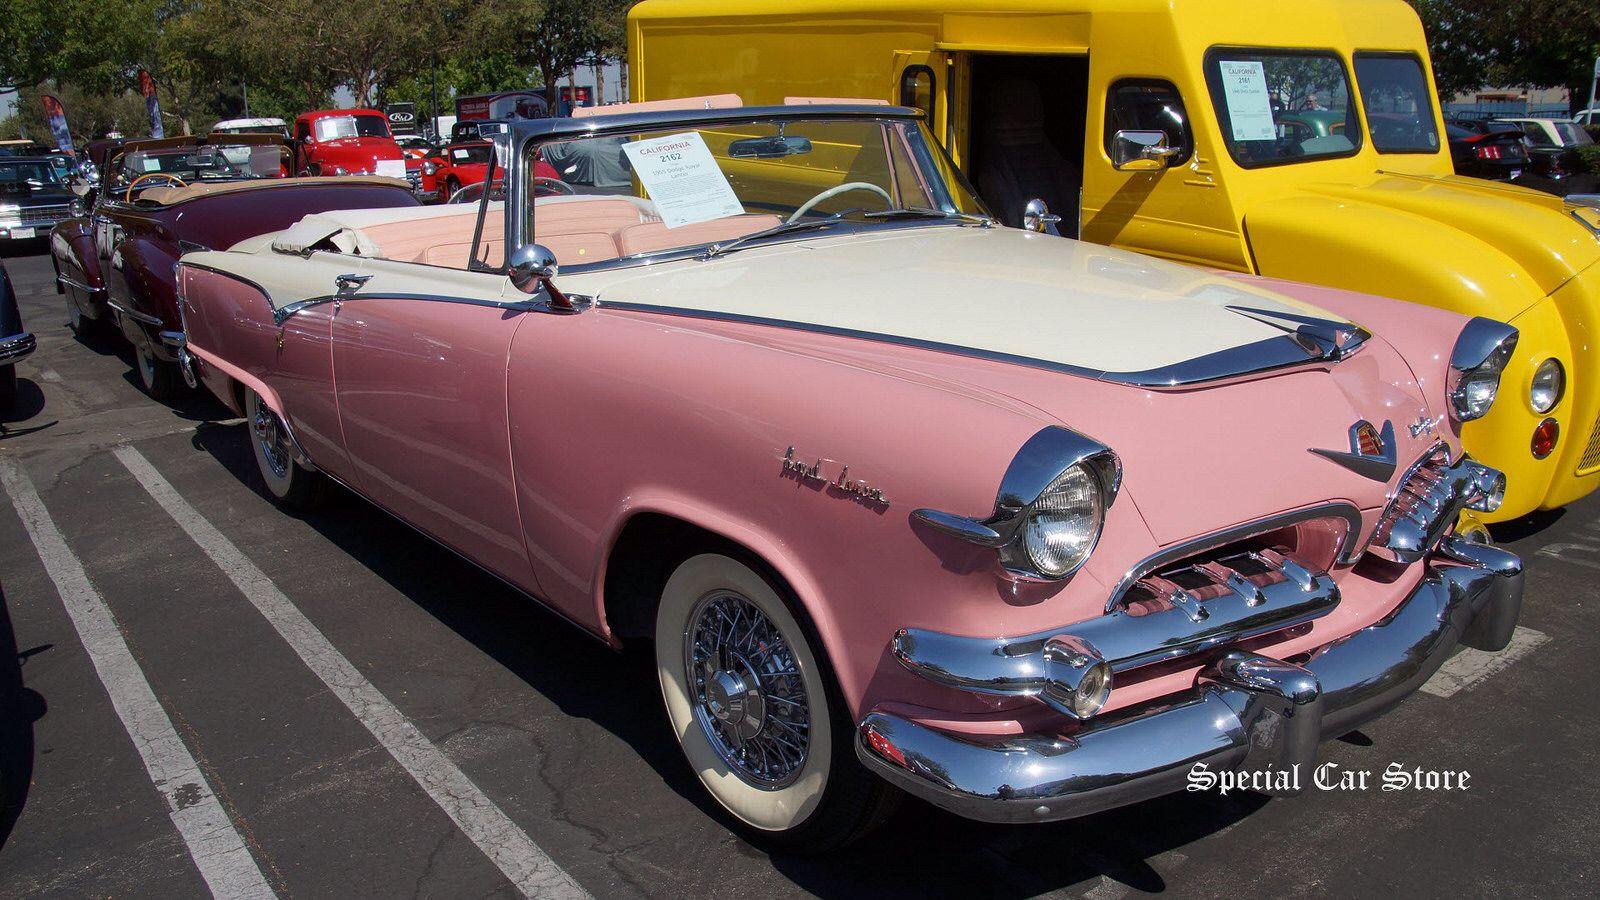 1955 dodge custom royal lancer 4 door sedan 15699 - 1955 Dodge Royal Lancer